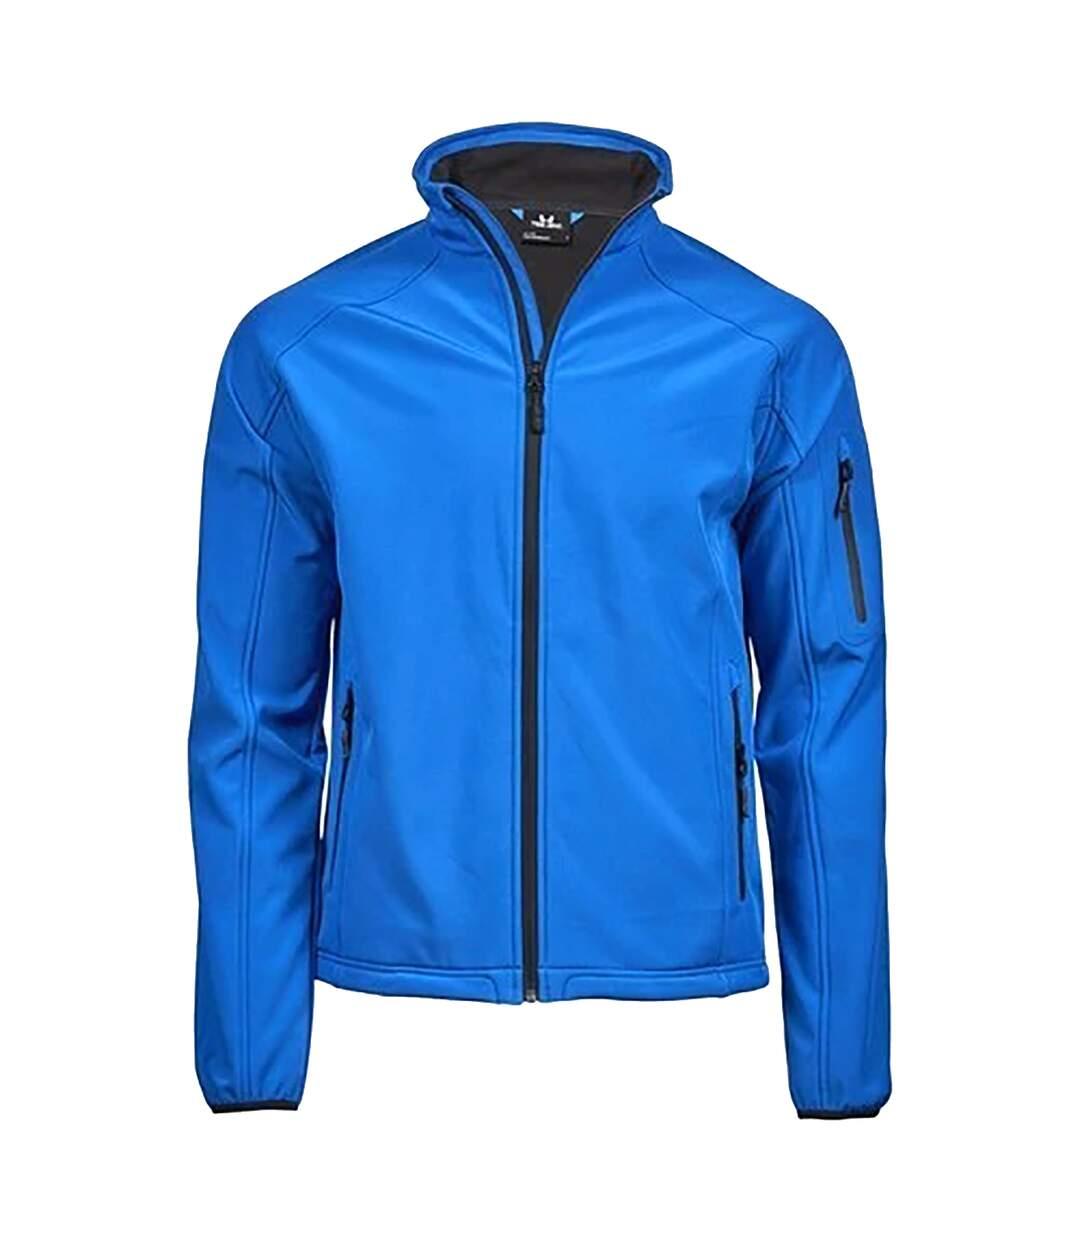 Tee Jays Mens Performance Softshell Jacket (Sky Diver) - UTBC3326